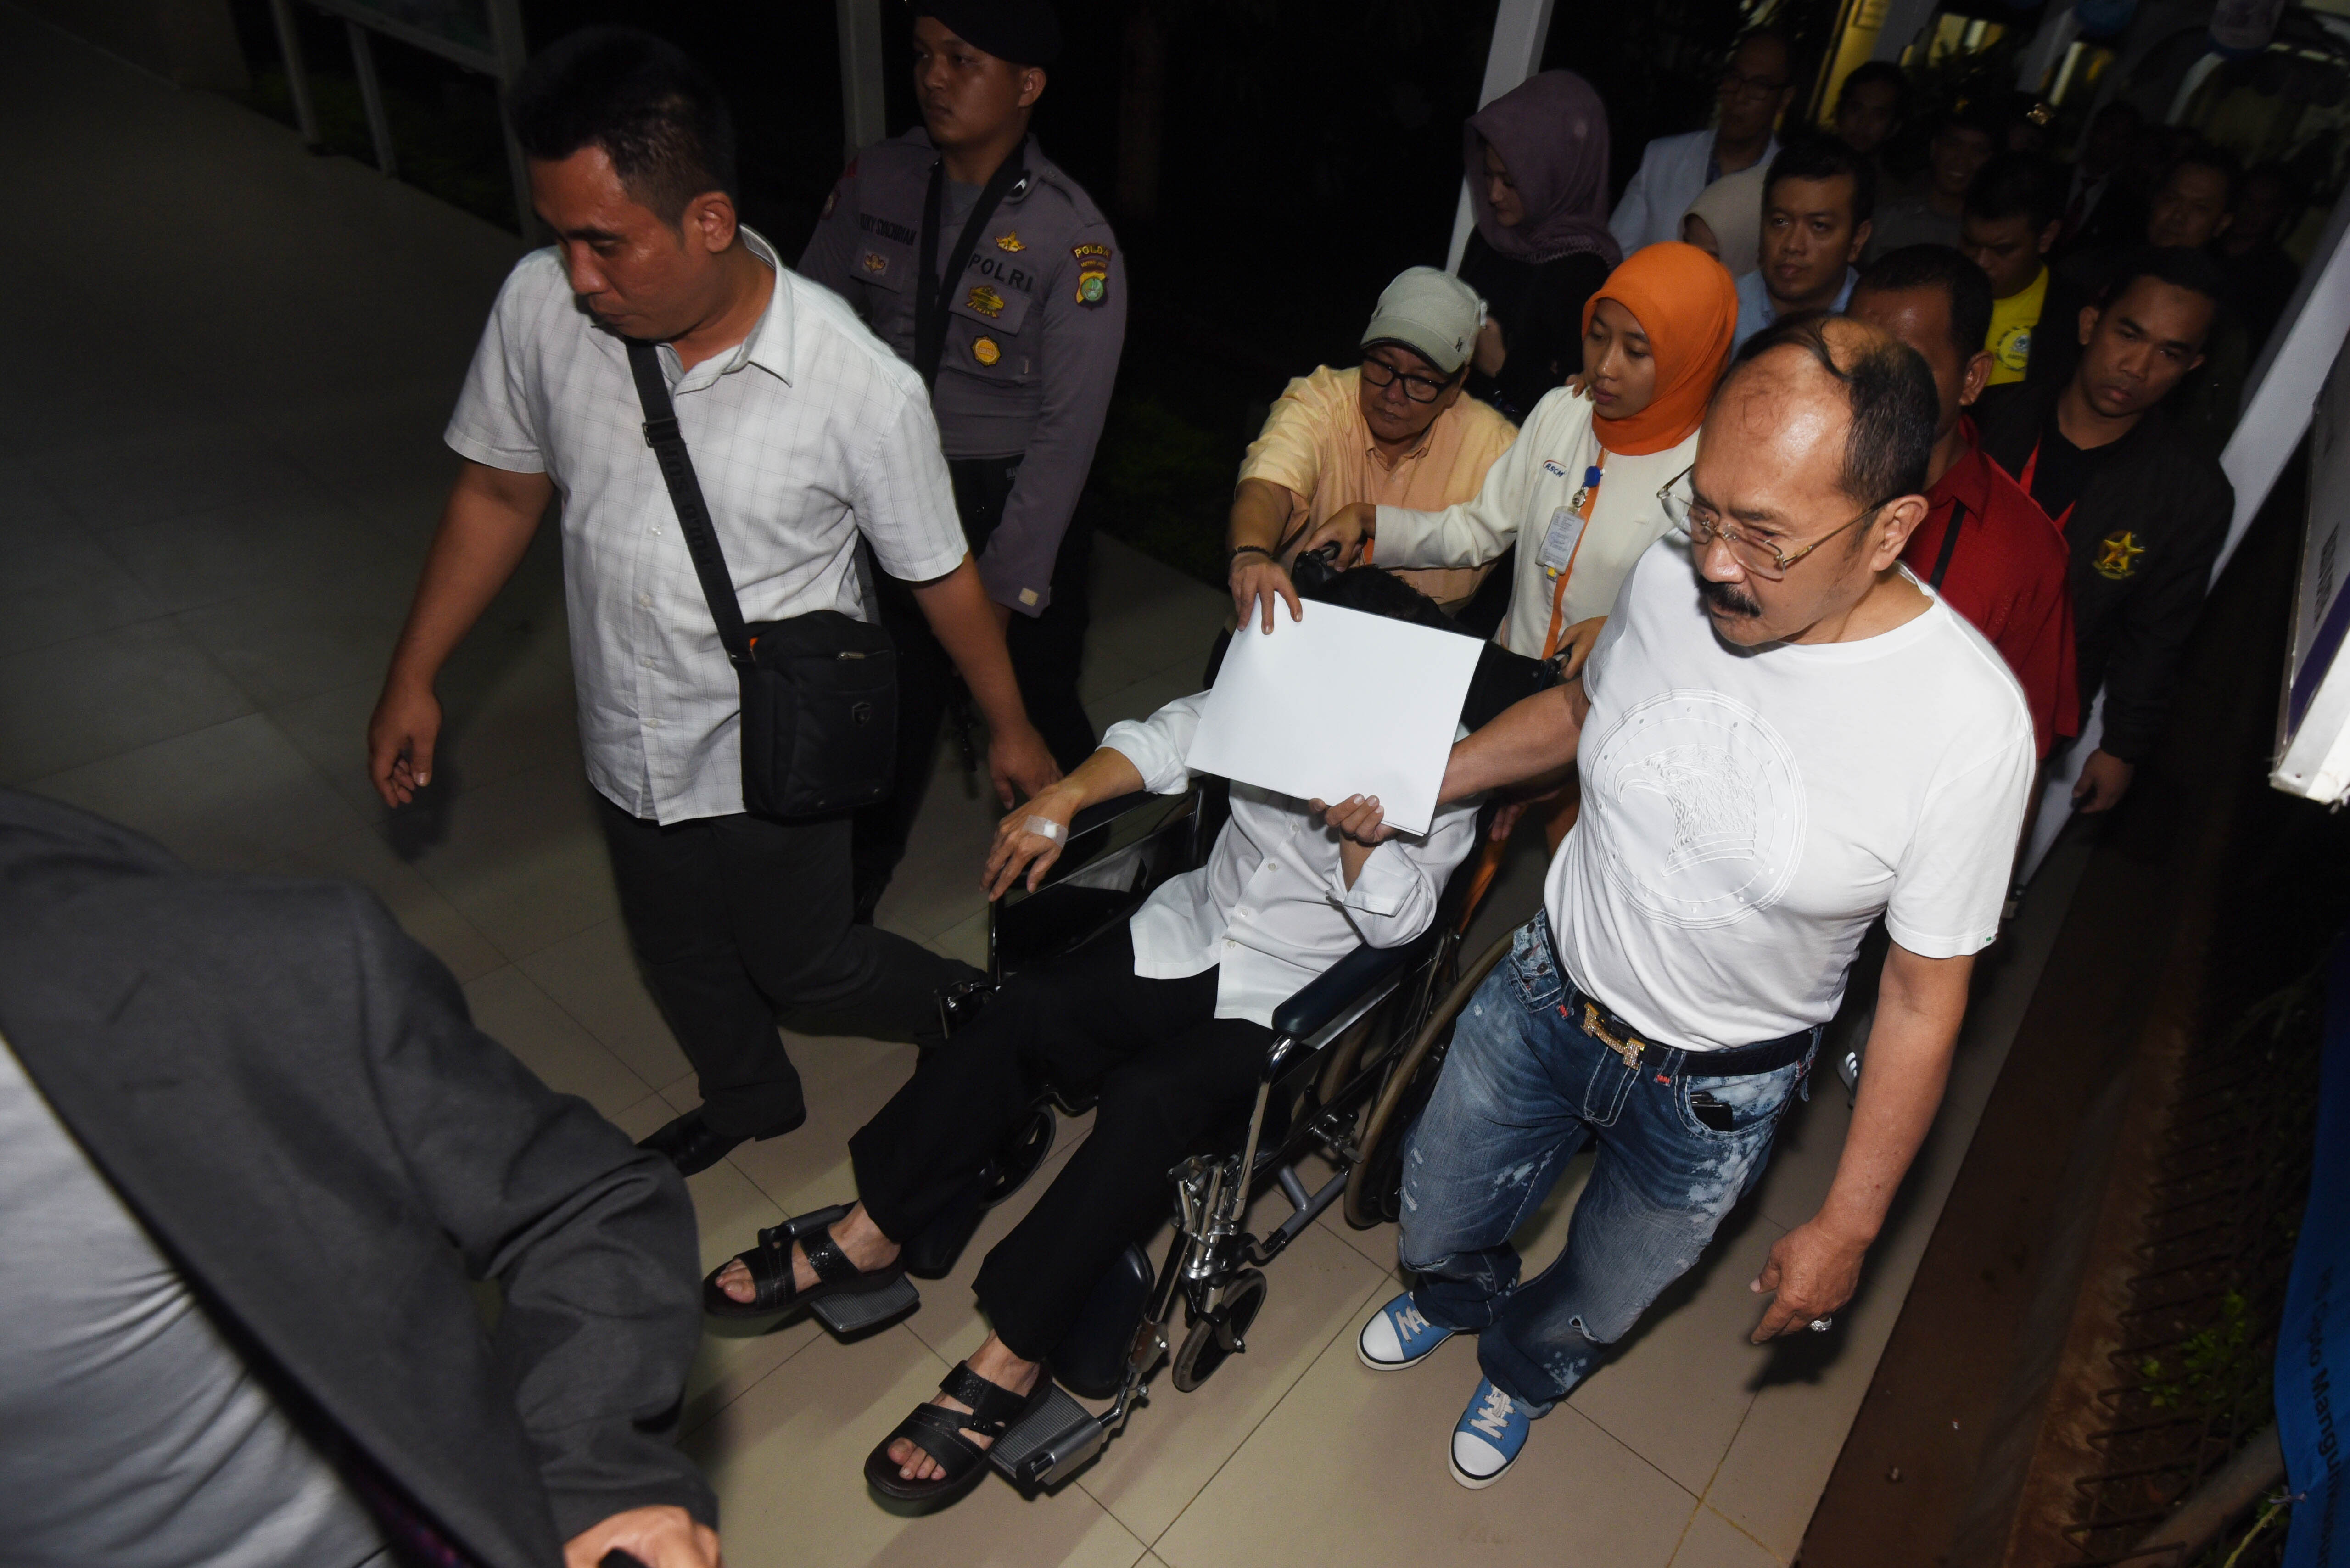 TINGGALKAN. Tersangka kasus korupsi KTP Elektronik Setya Novanto meninggalkan RSCM untuk dibawa ke rutan KPK di Jakarta, Minggu, 19 November. Foto oleh Akbar Nugroho Gumay/ANTARA